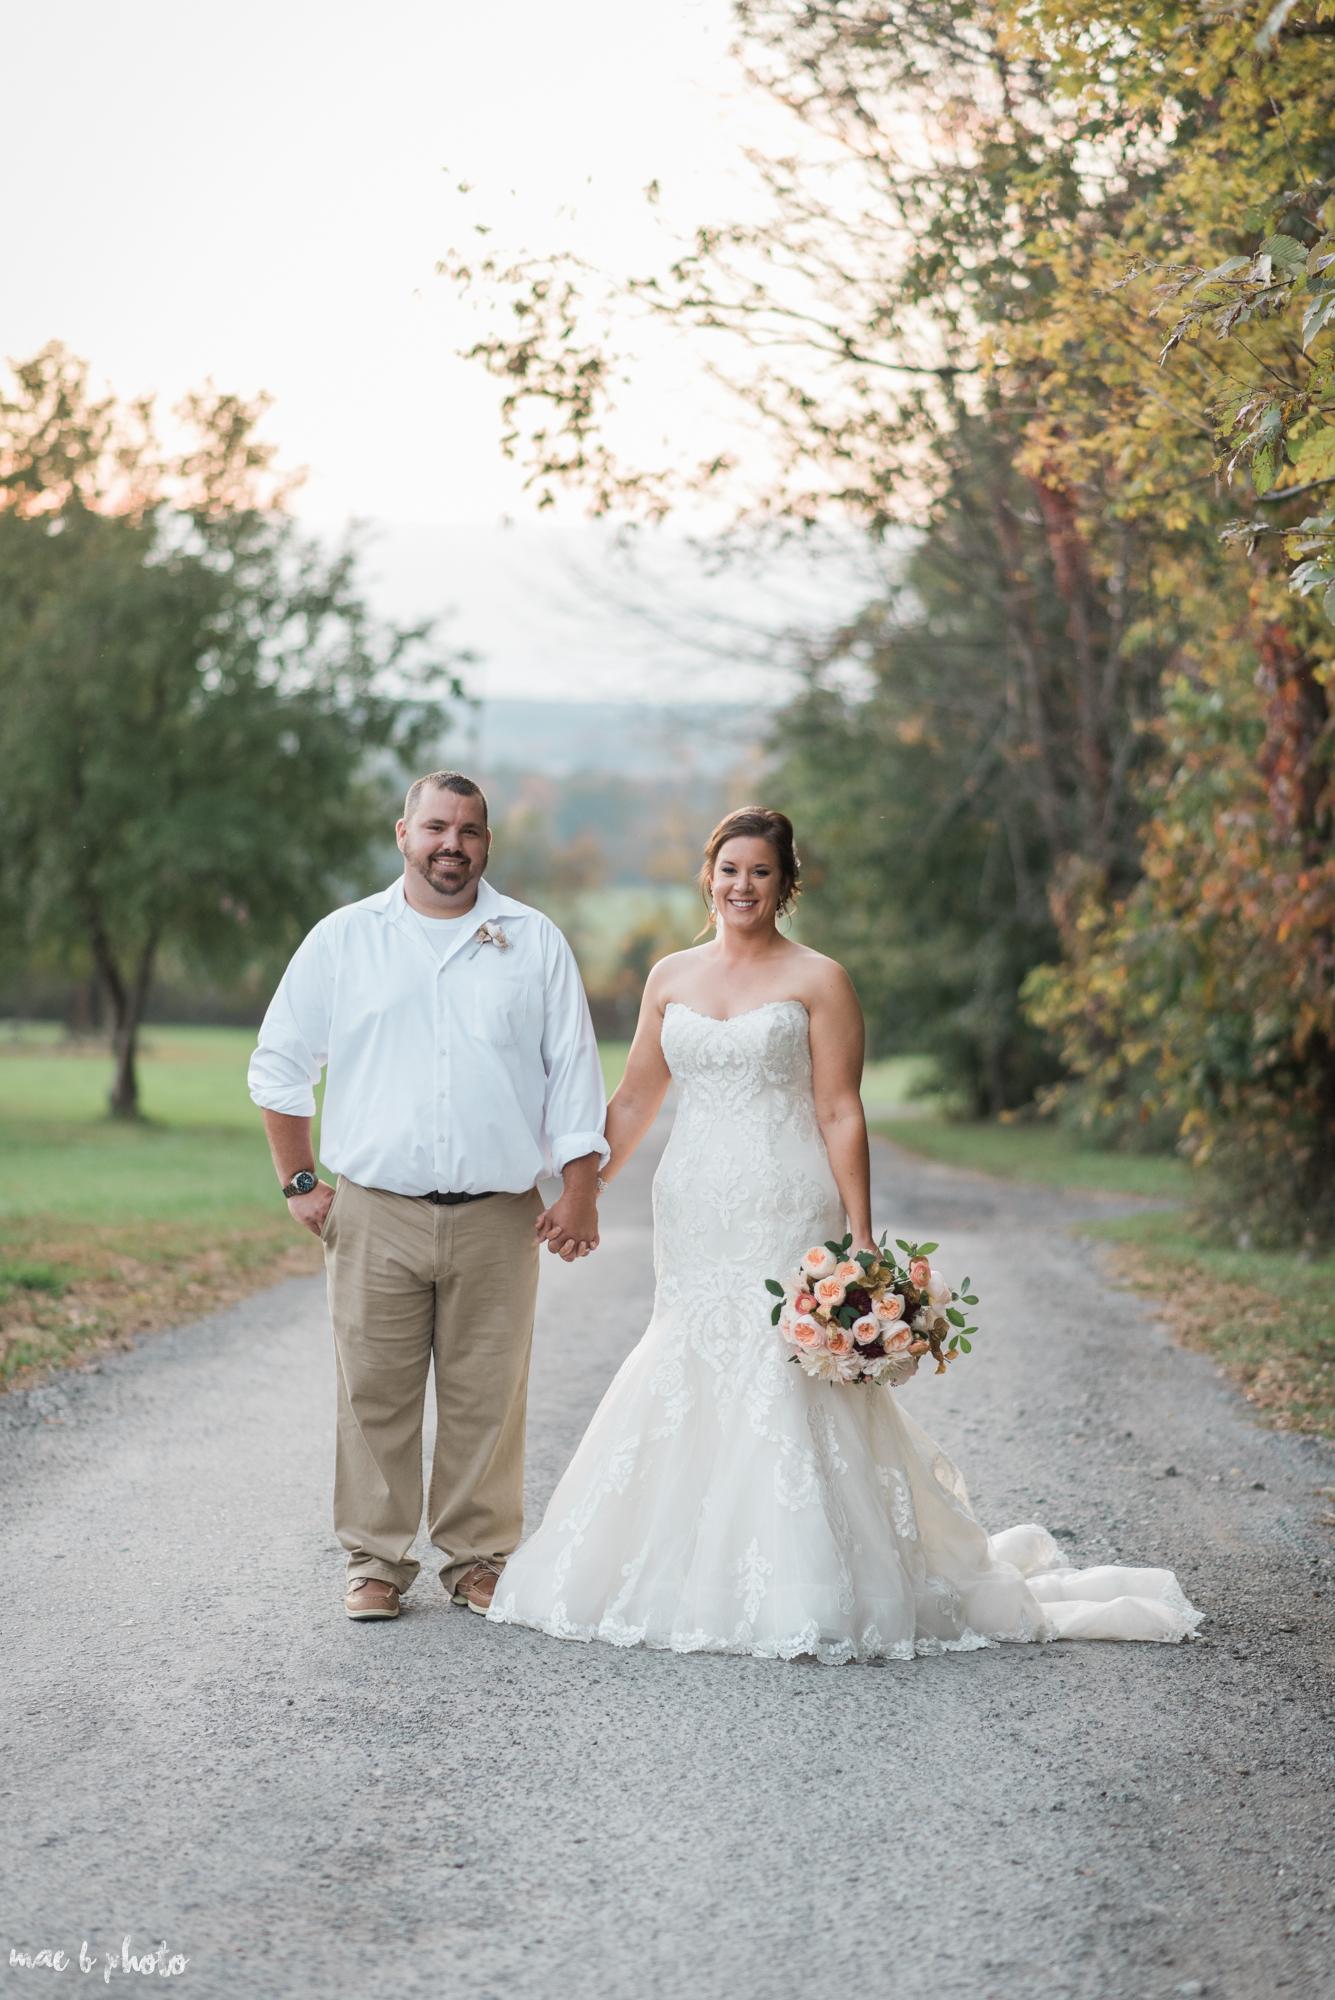 Sarah & Dustin's Rustic Chic Barn Wedding at Hartford Hill Winery in Hartford, Ohio by Mae B Photo-89.jpg